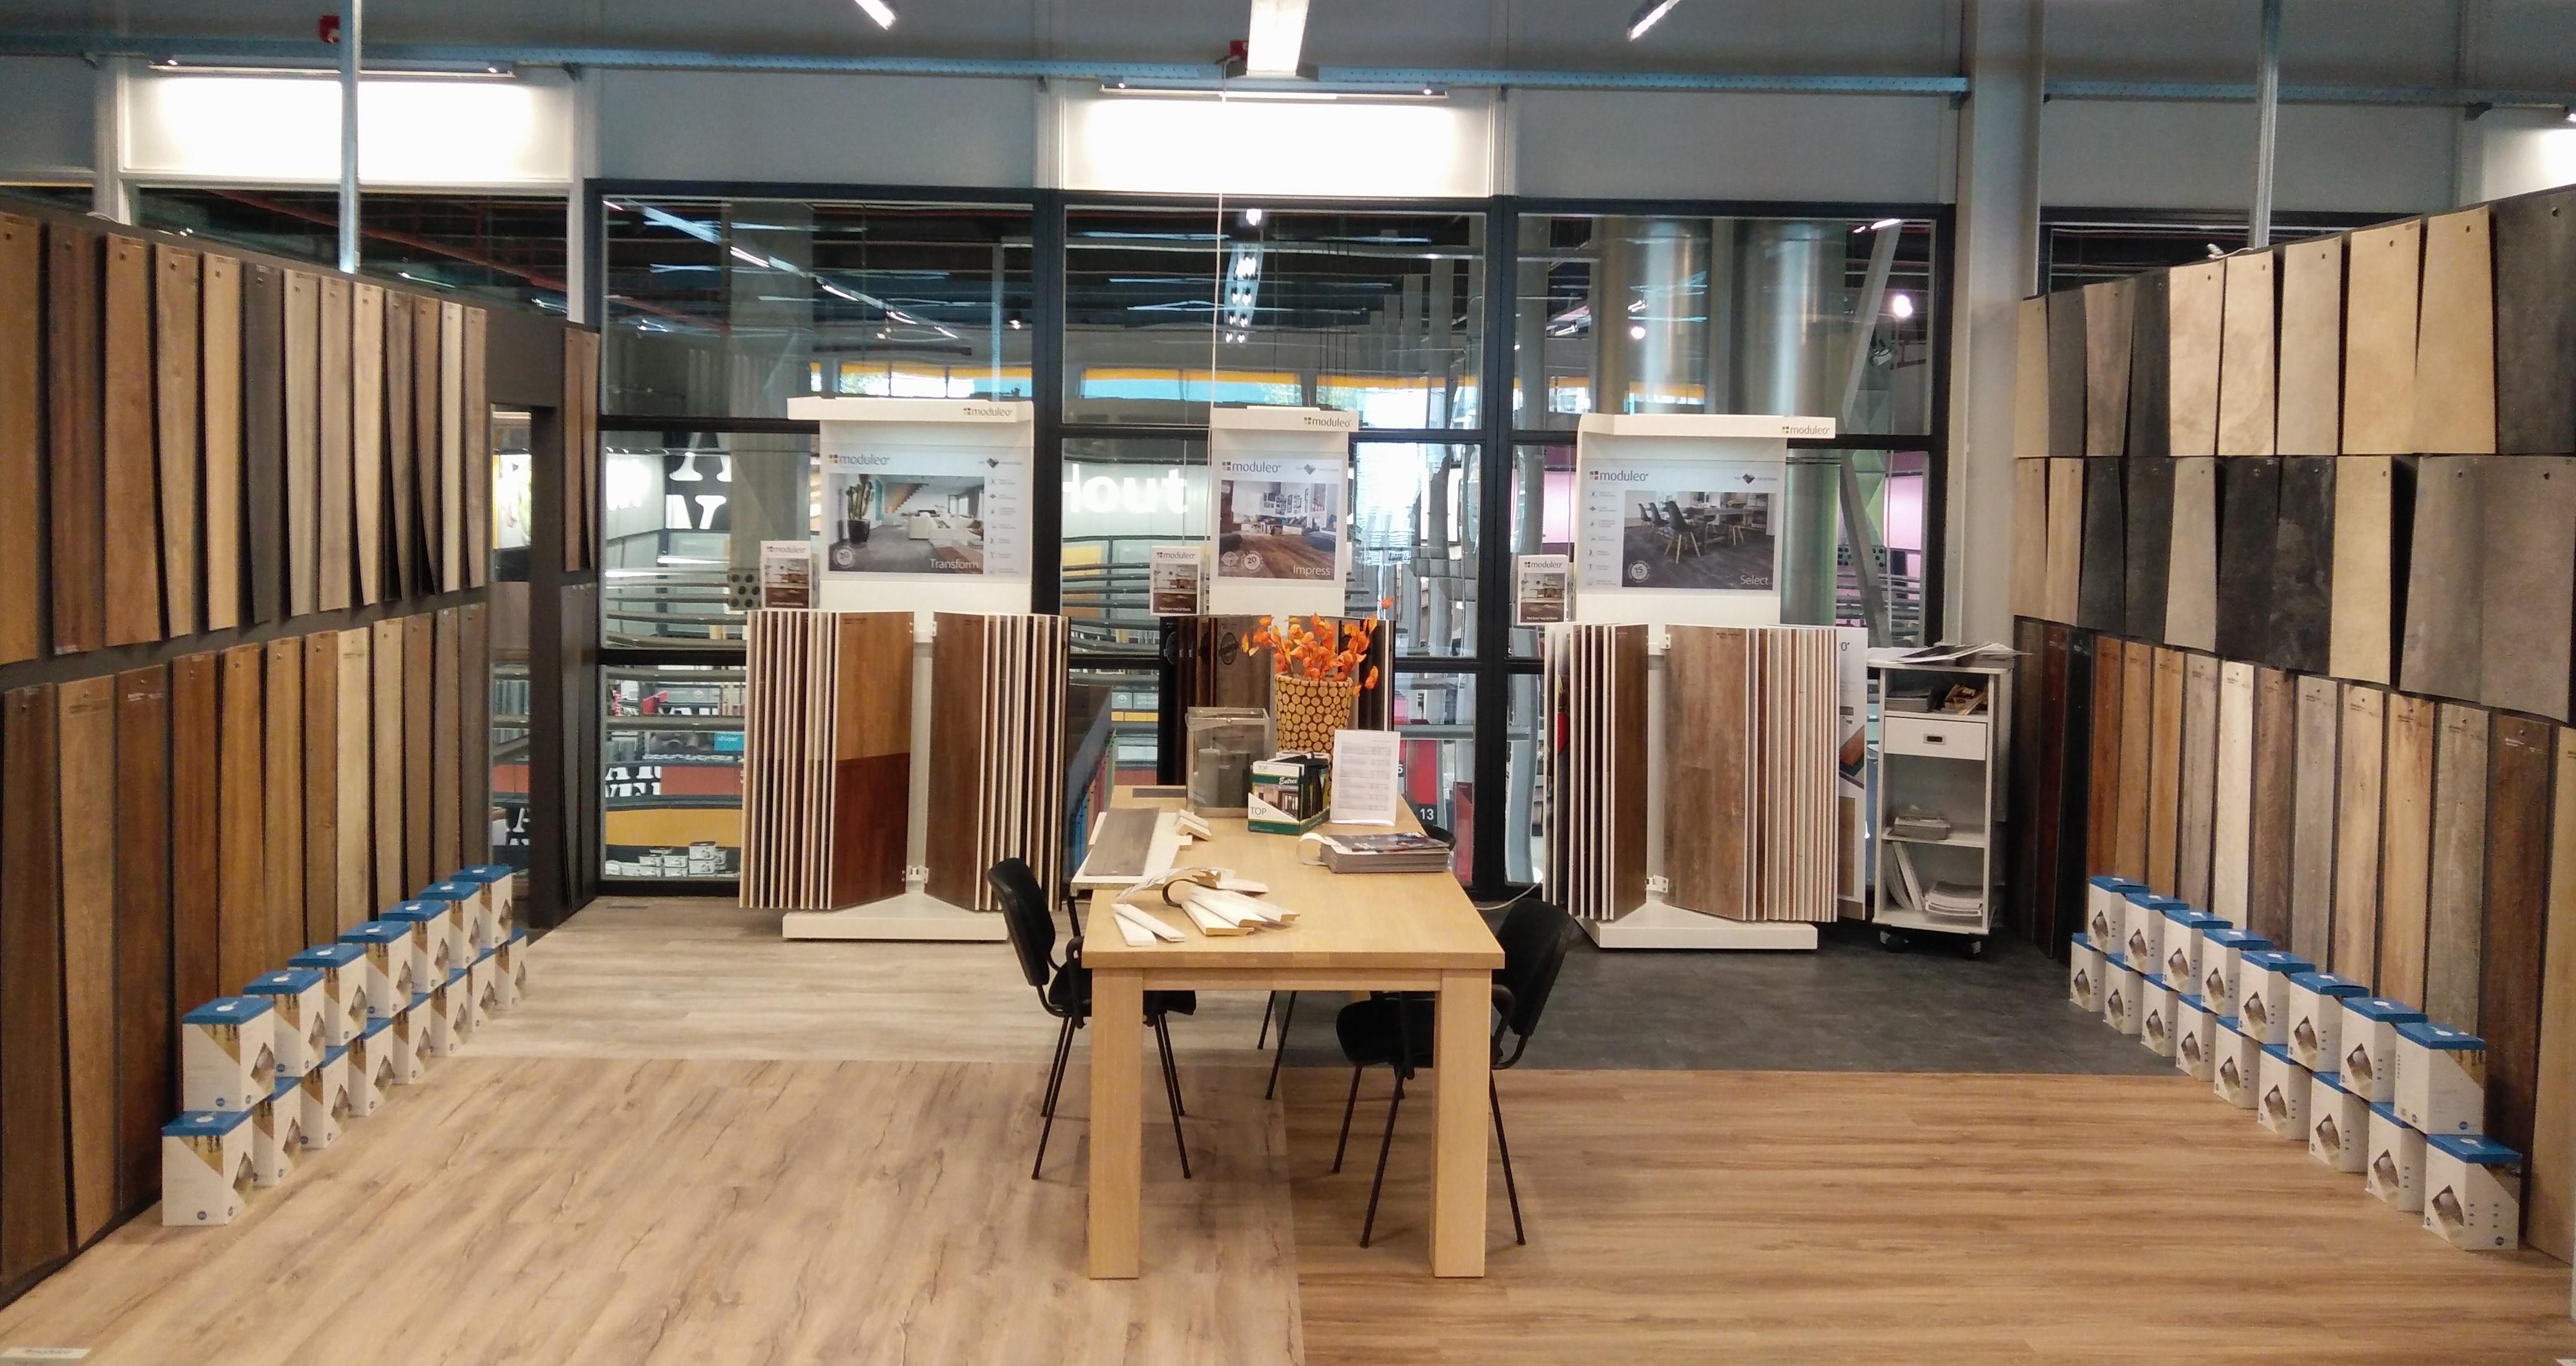 Pvc Vloeren Specialist : Pvc vloeren gratis inmeten gelegd multi keuken bad